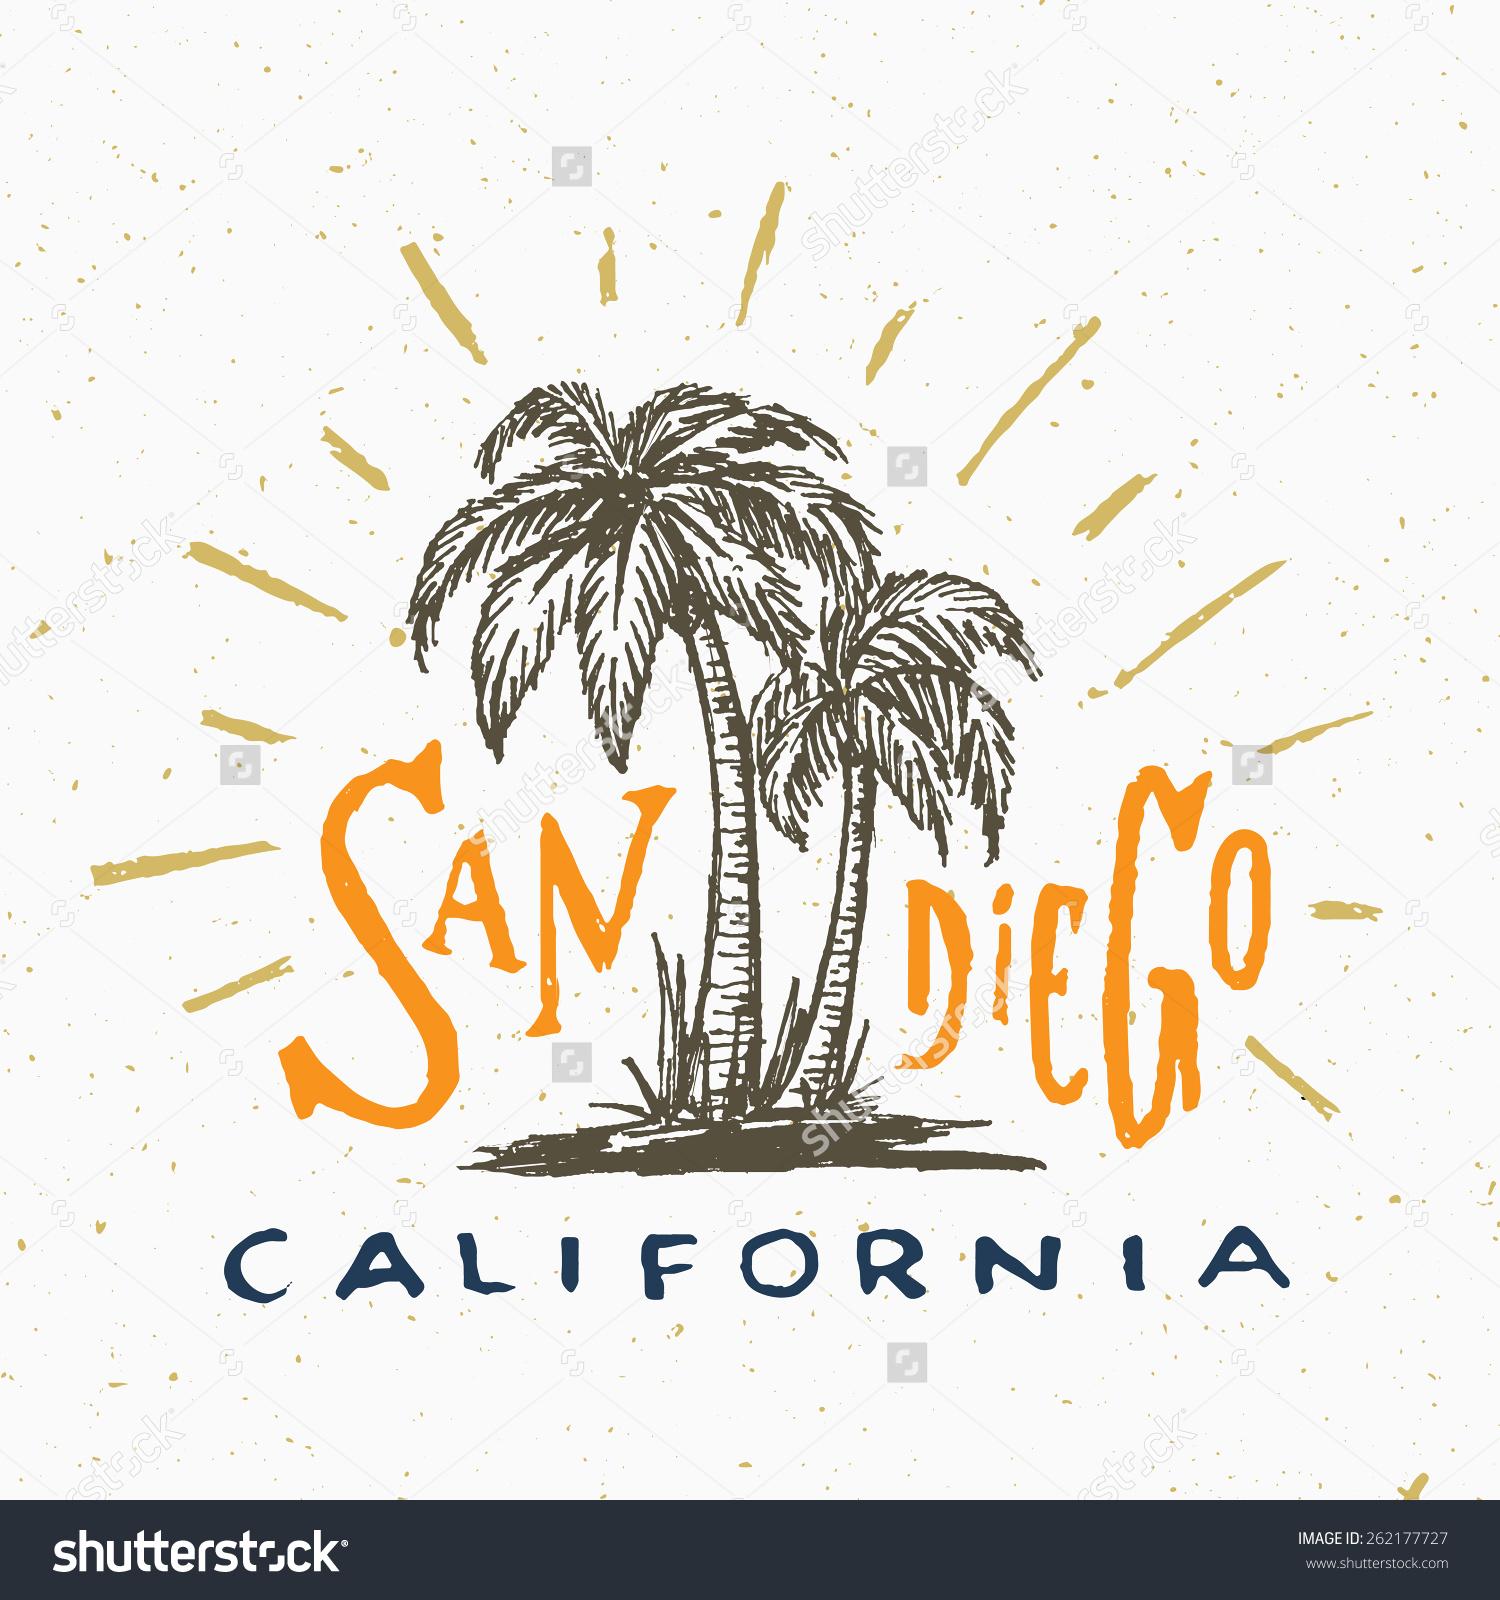 San Diego clipart Clipart #13 Diego 53 Fans